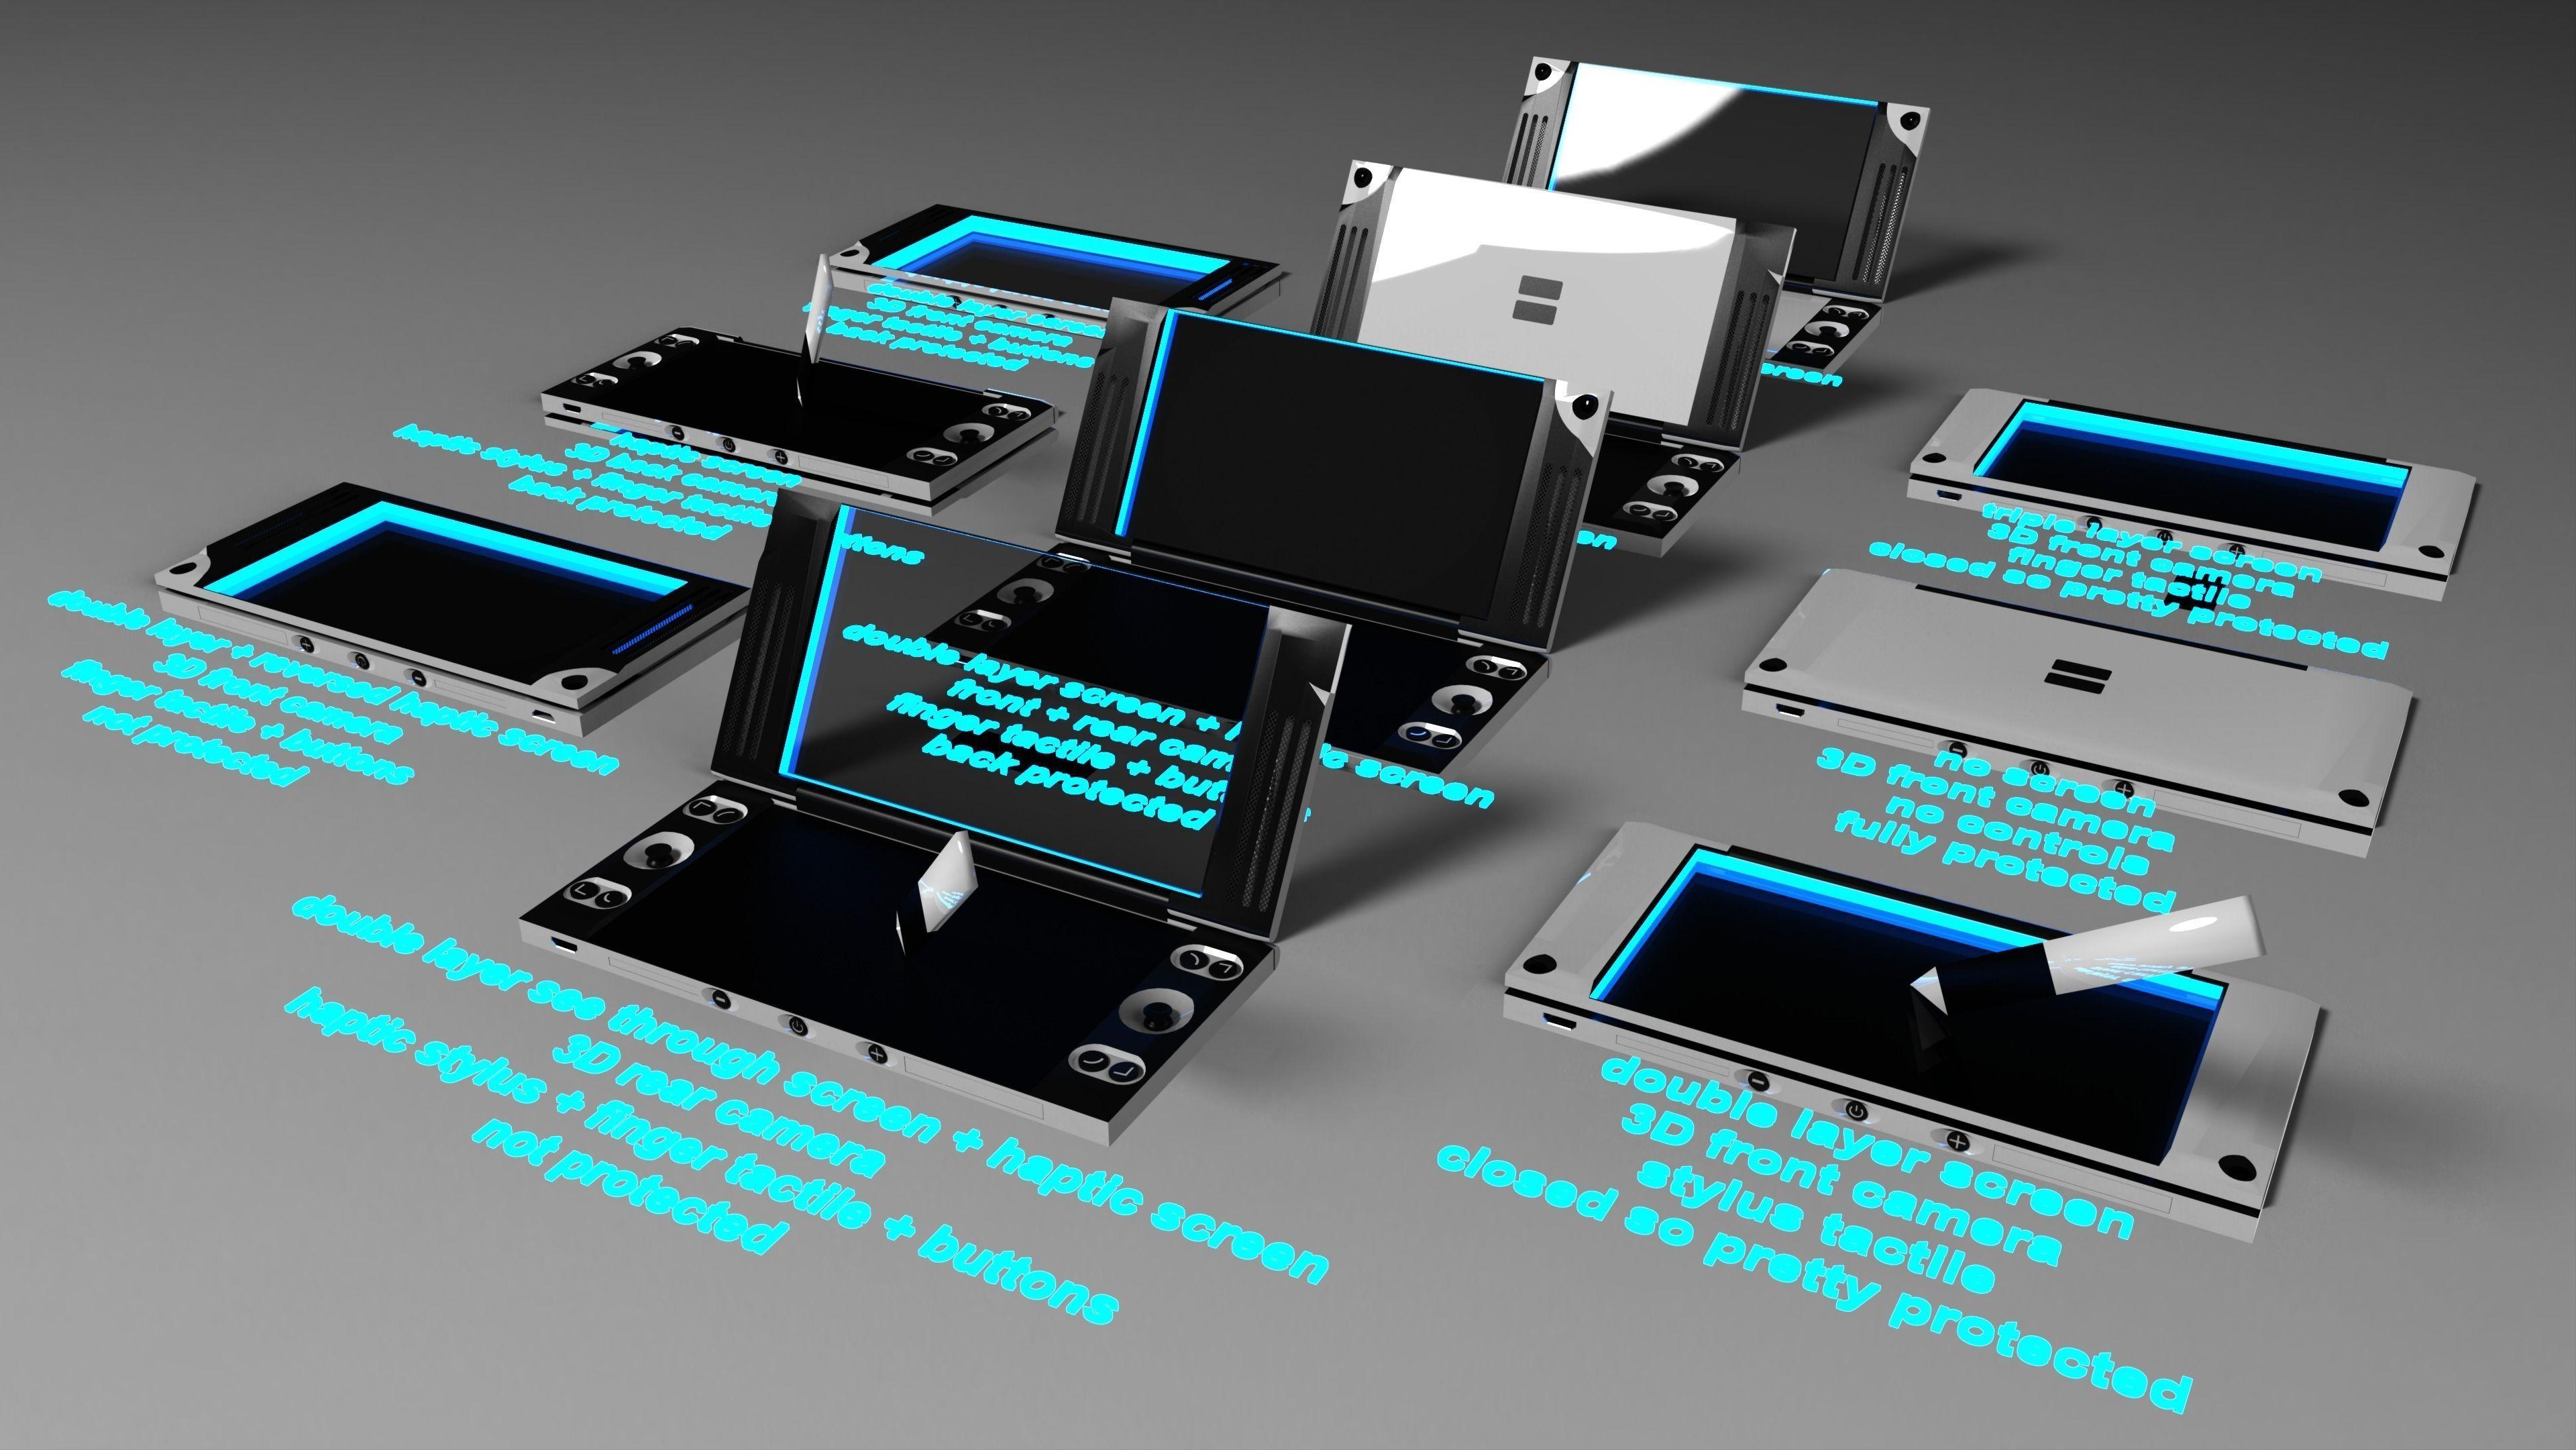 nintendo ds fusion idea free 3d model stl skp sldprt. Black Bedroom Furniture Sets. Home Design Ideas